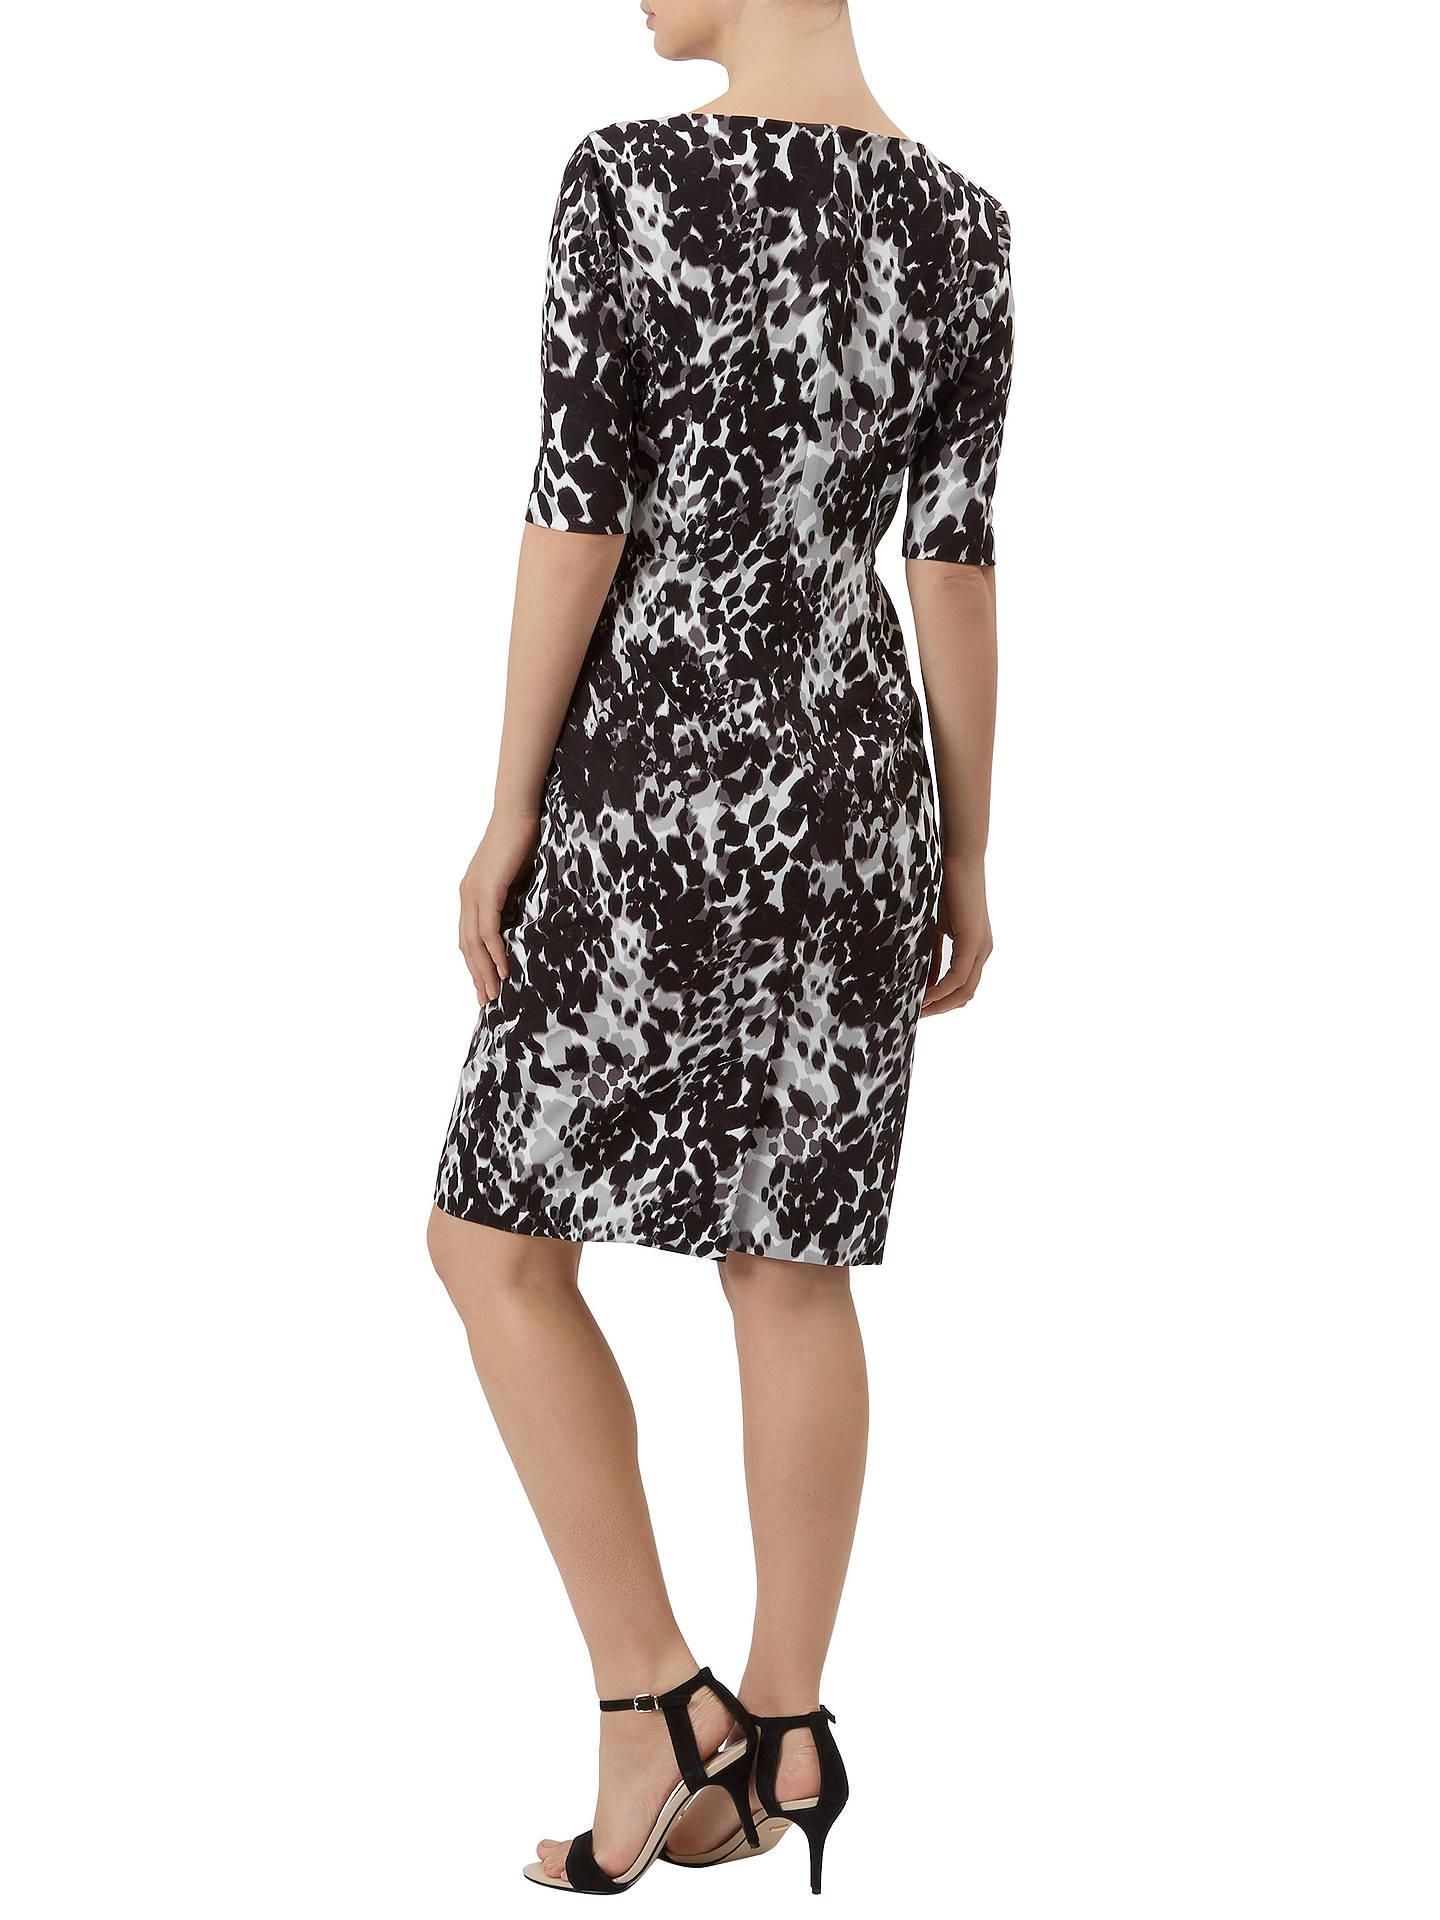 ... BuyFenn Wright Manson Petite Athena Animal Print Dress c67ad73c1